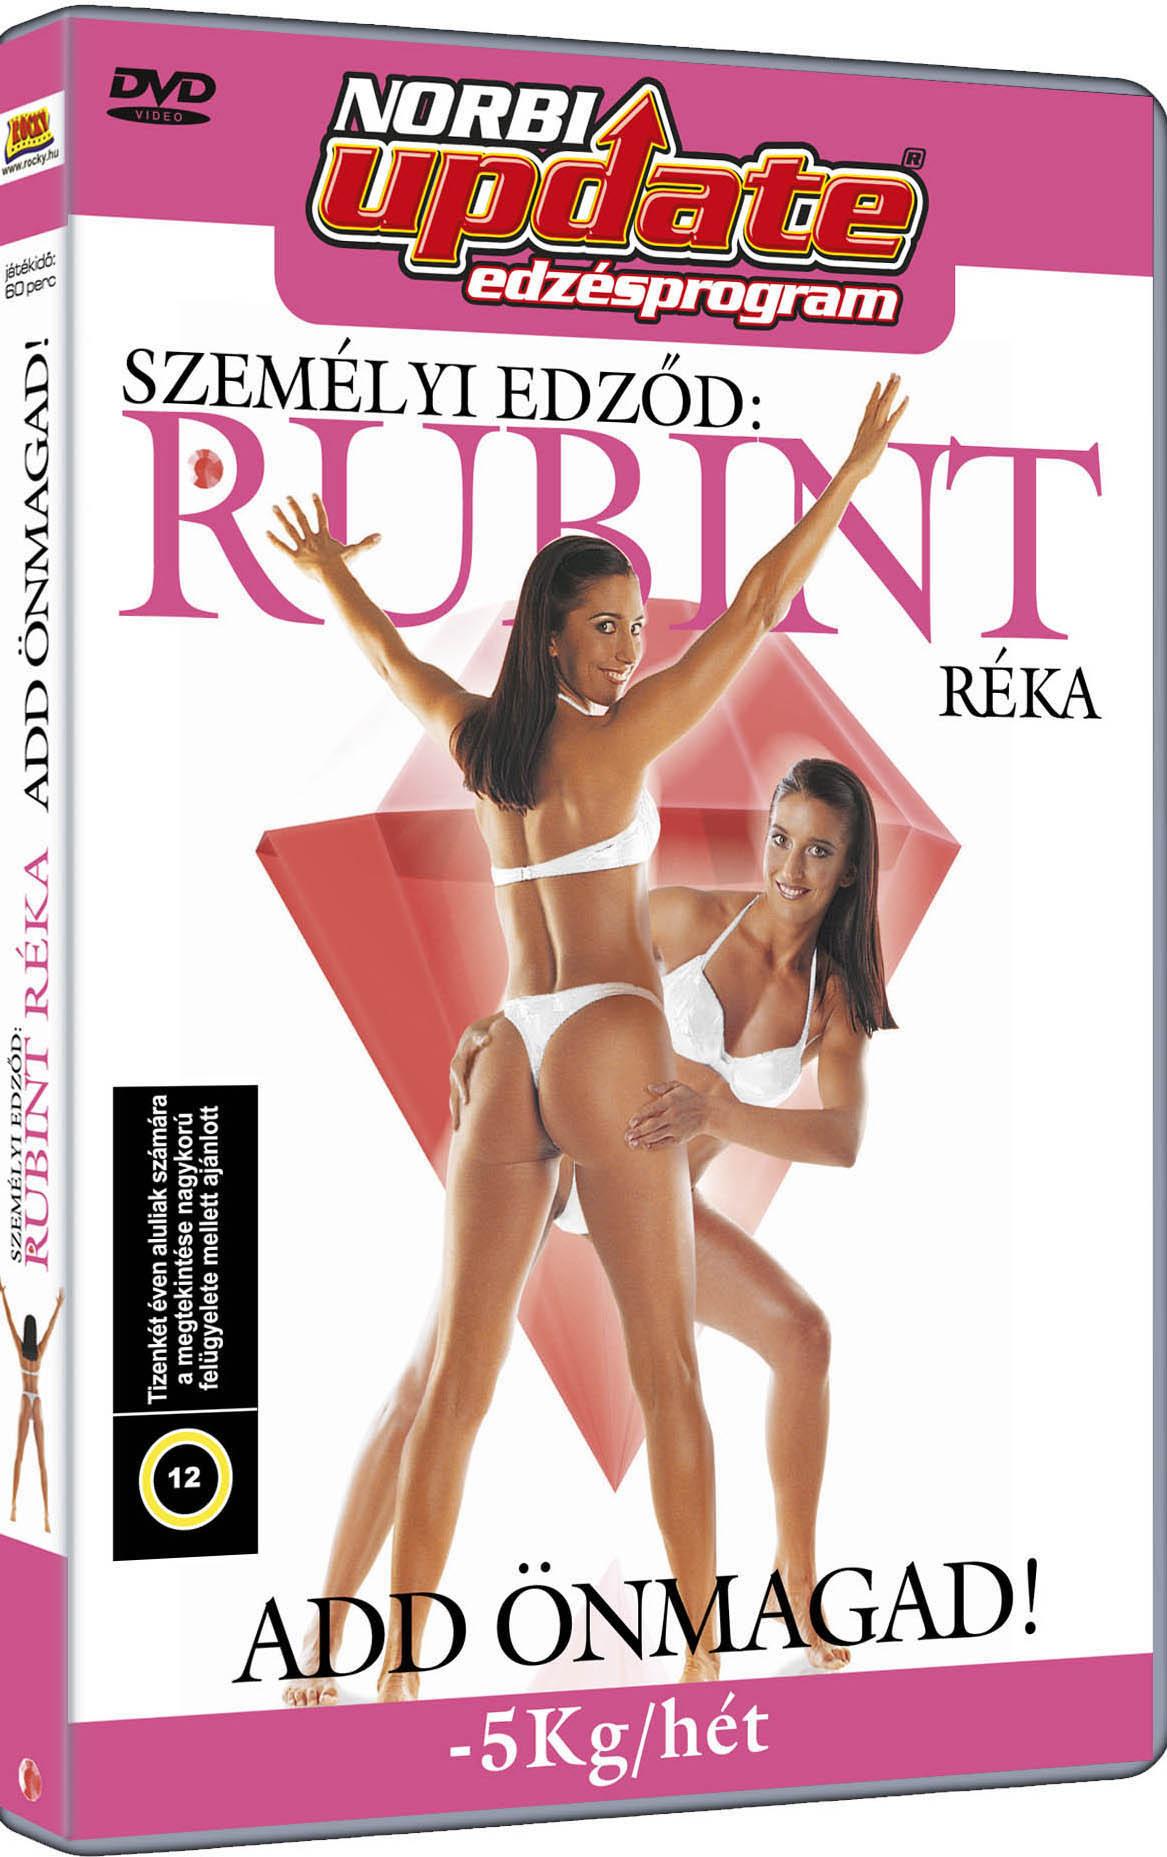 14aaf8fa89 dvdabc.hu - DVD WEBSHOP, BLU-RAY WEBSHOP - DVD : RUBINT RÉKA: ADD ÖNMAGAD 1.